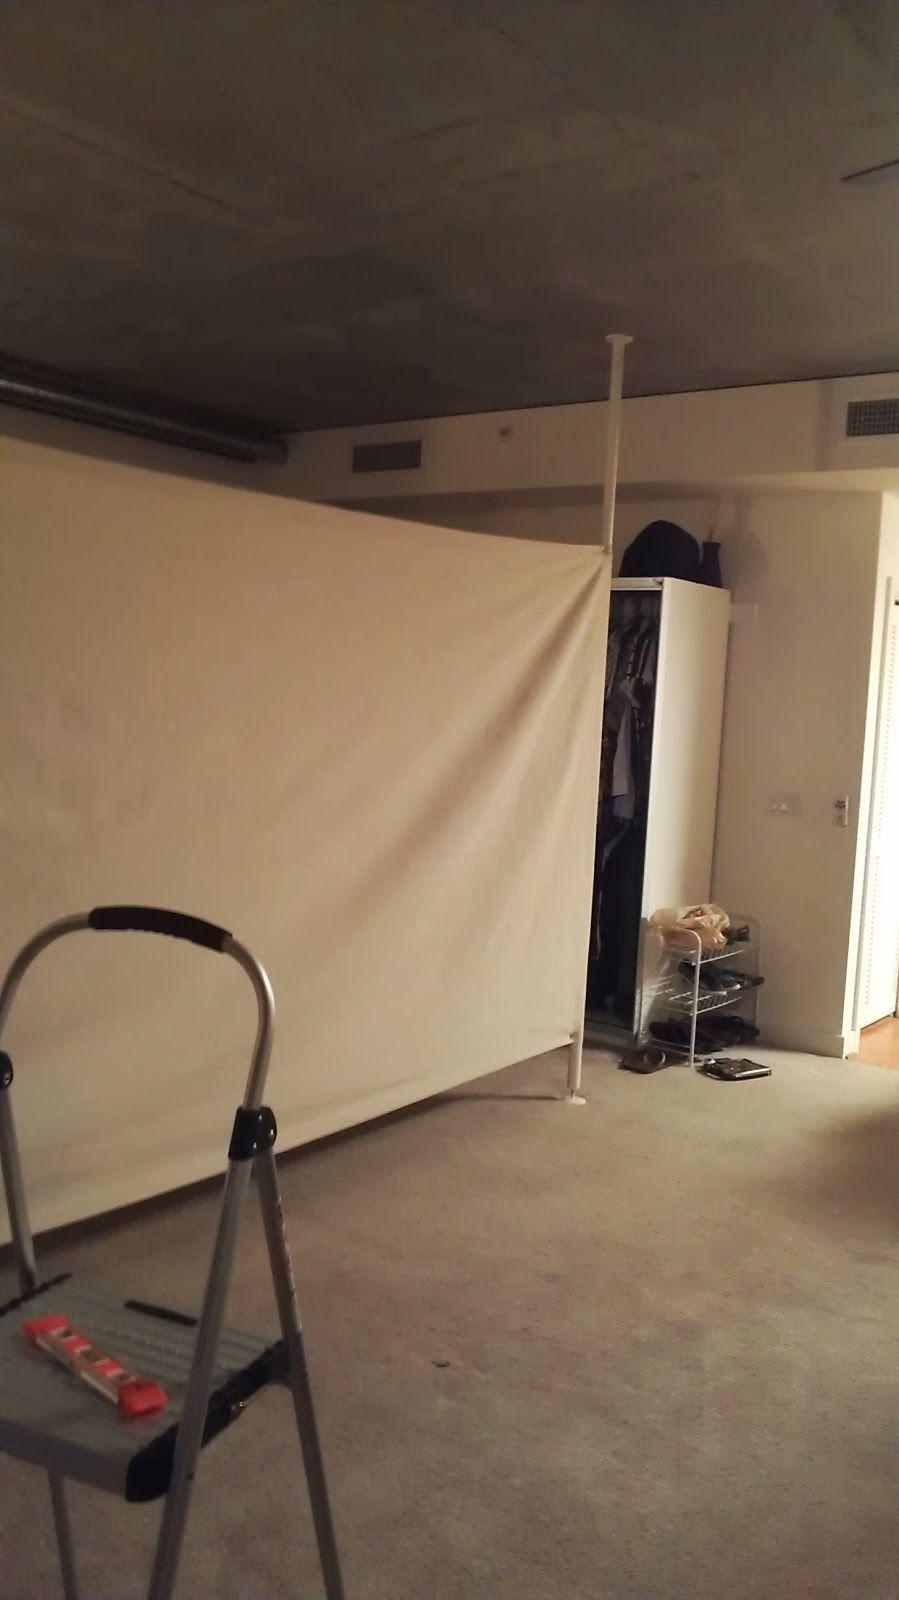 Astonishing Useful Ideas Portable Room Divider Fabric Beautiful With Tv Built Ins Mid Century Diy